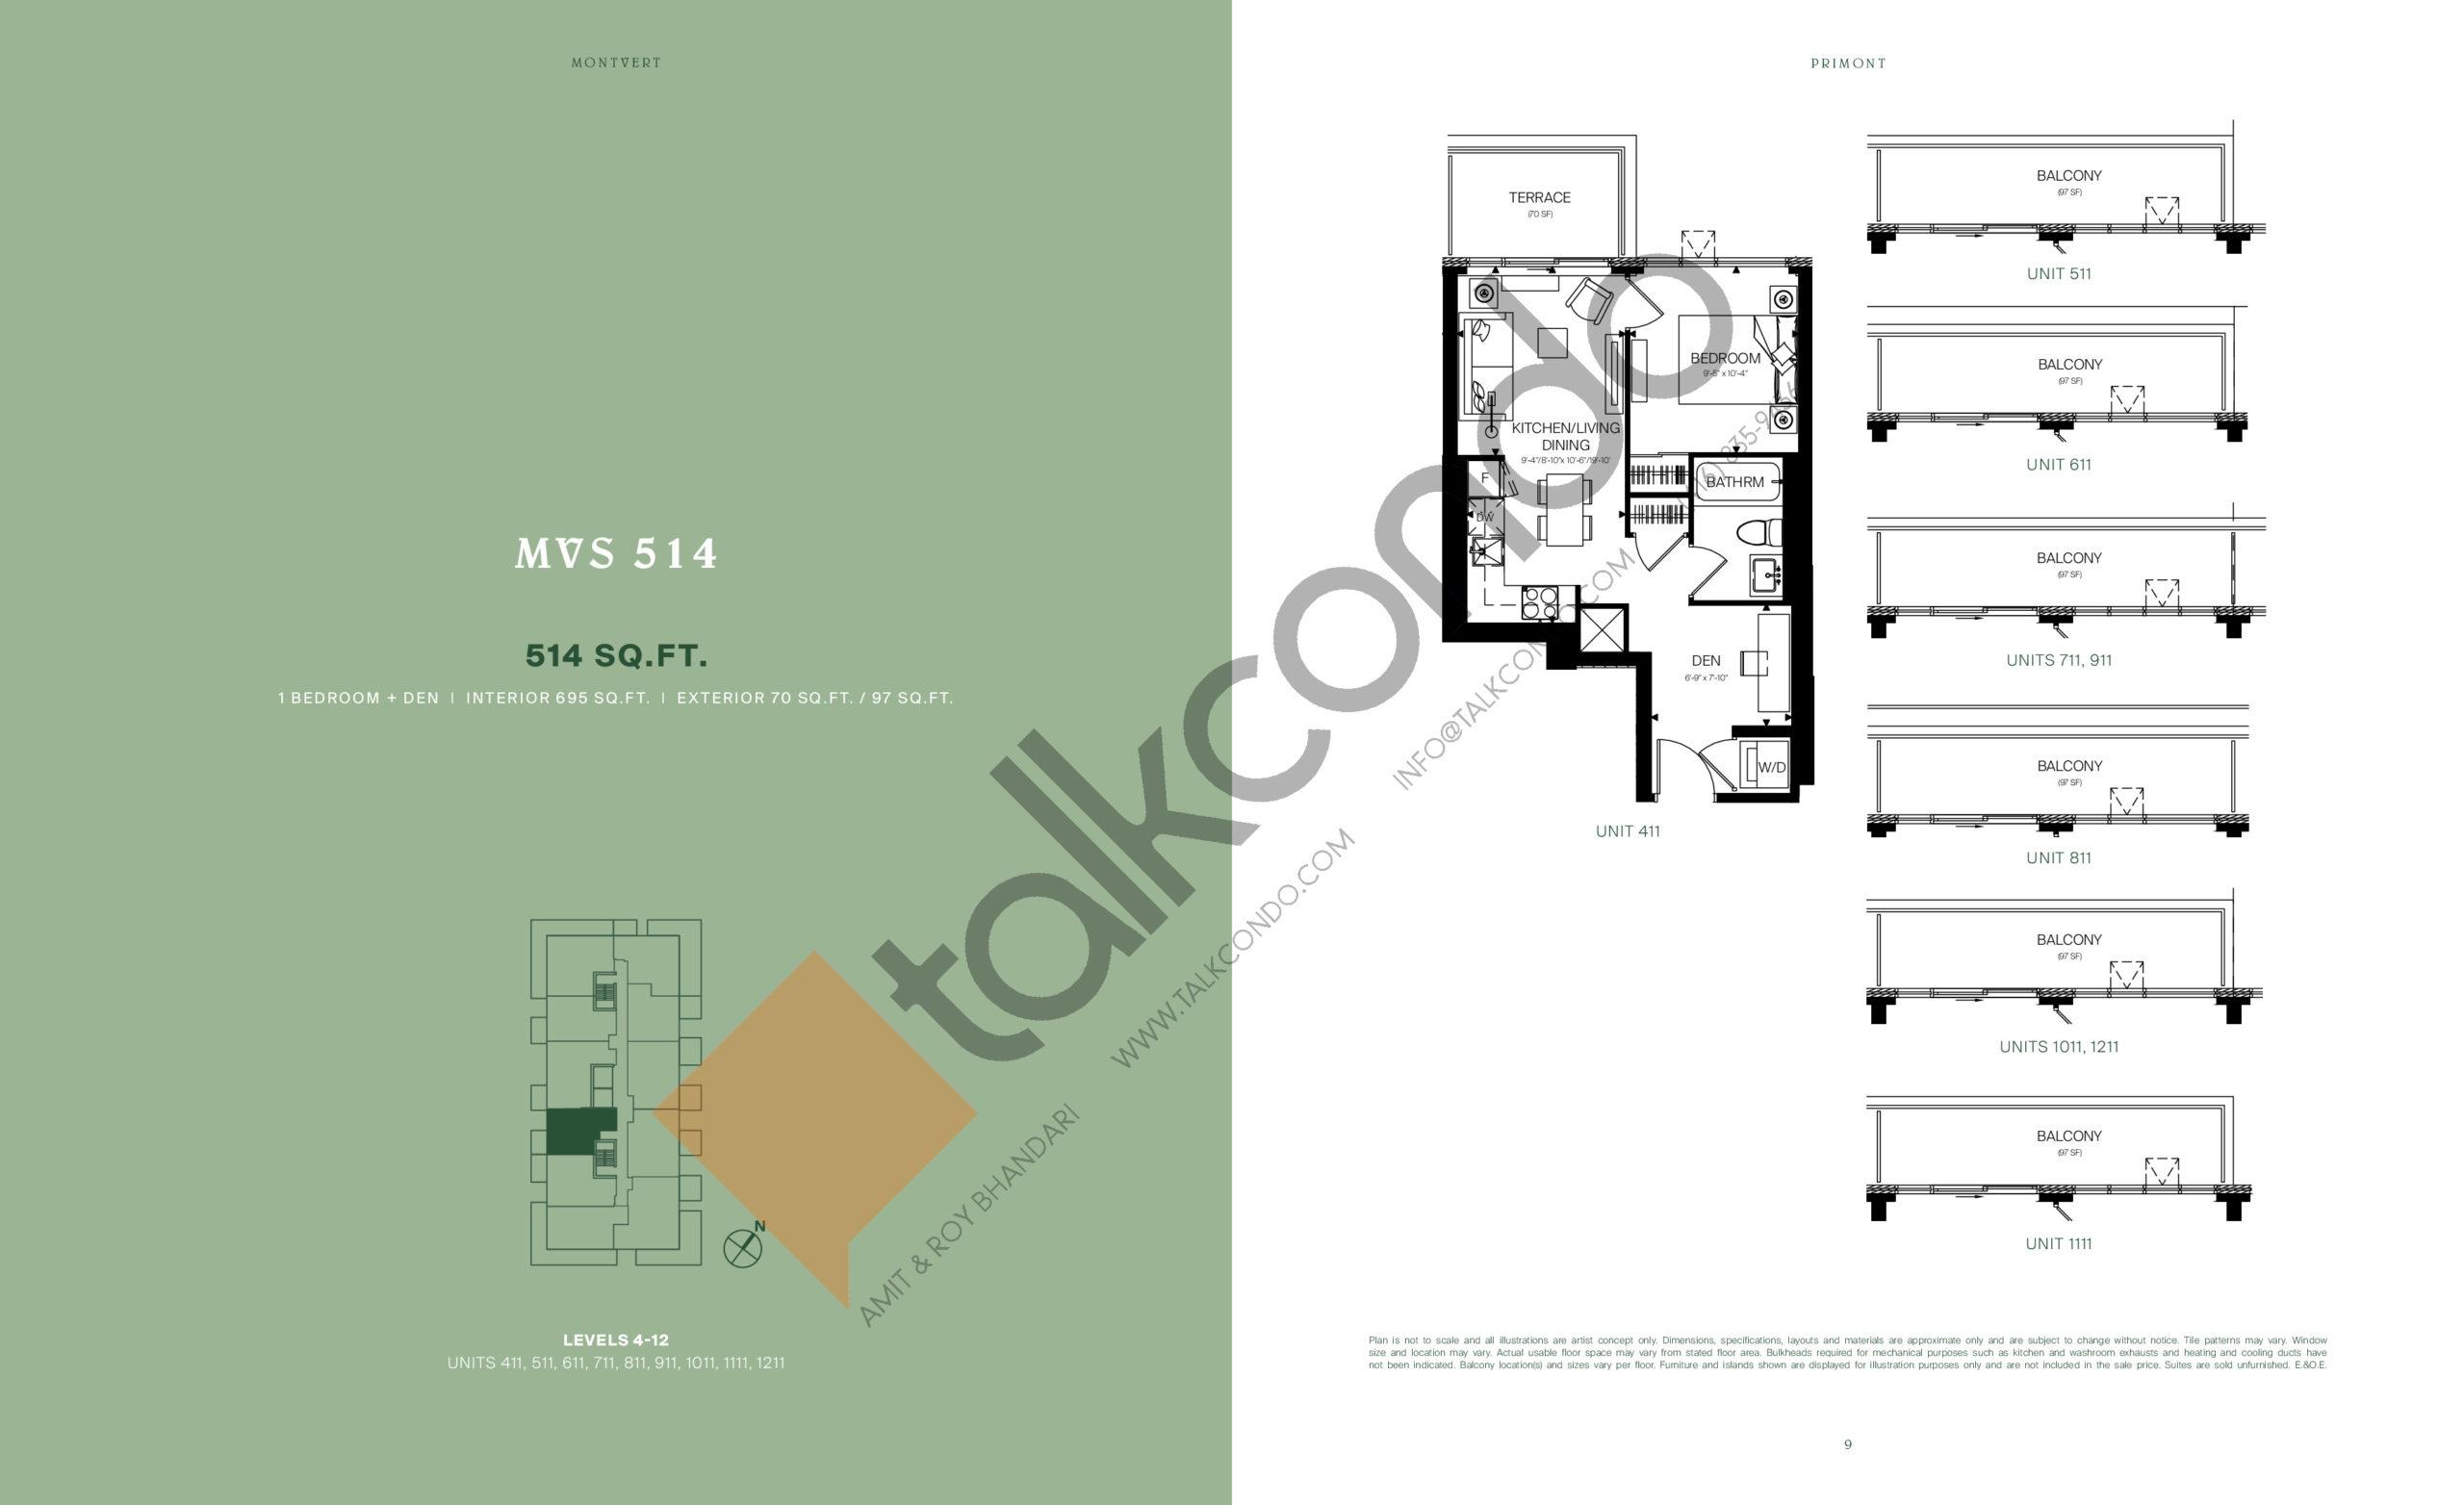 MVS 514 Floor Plan at MontVert Condos - 514 sq.ft